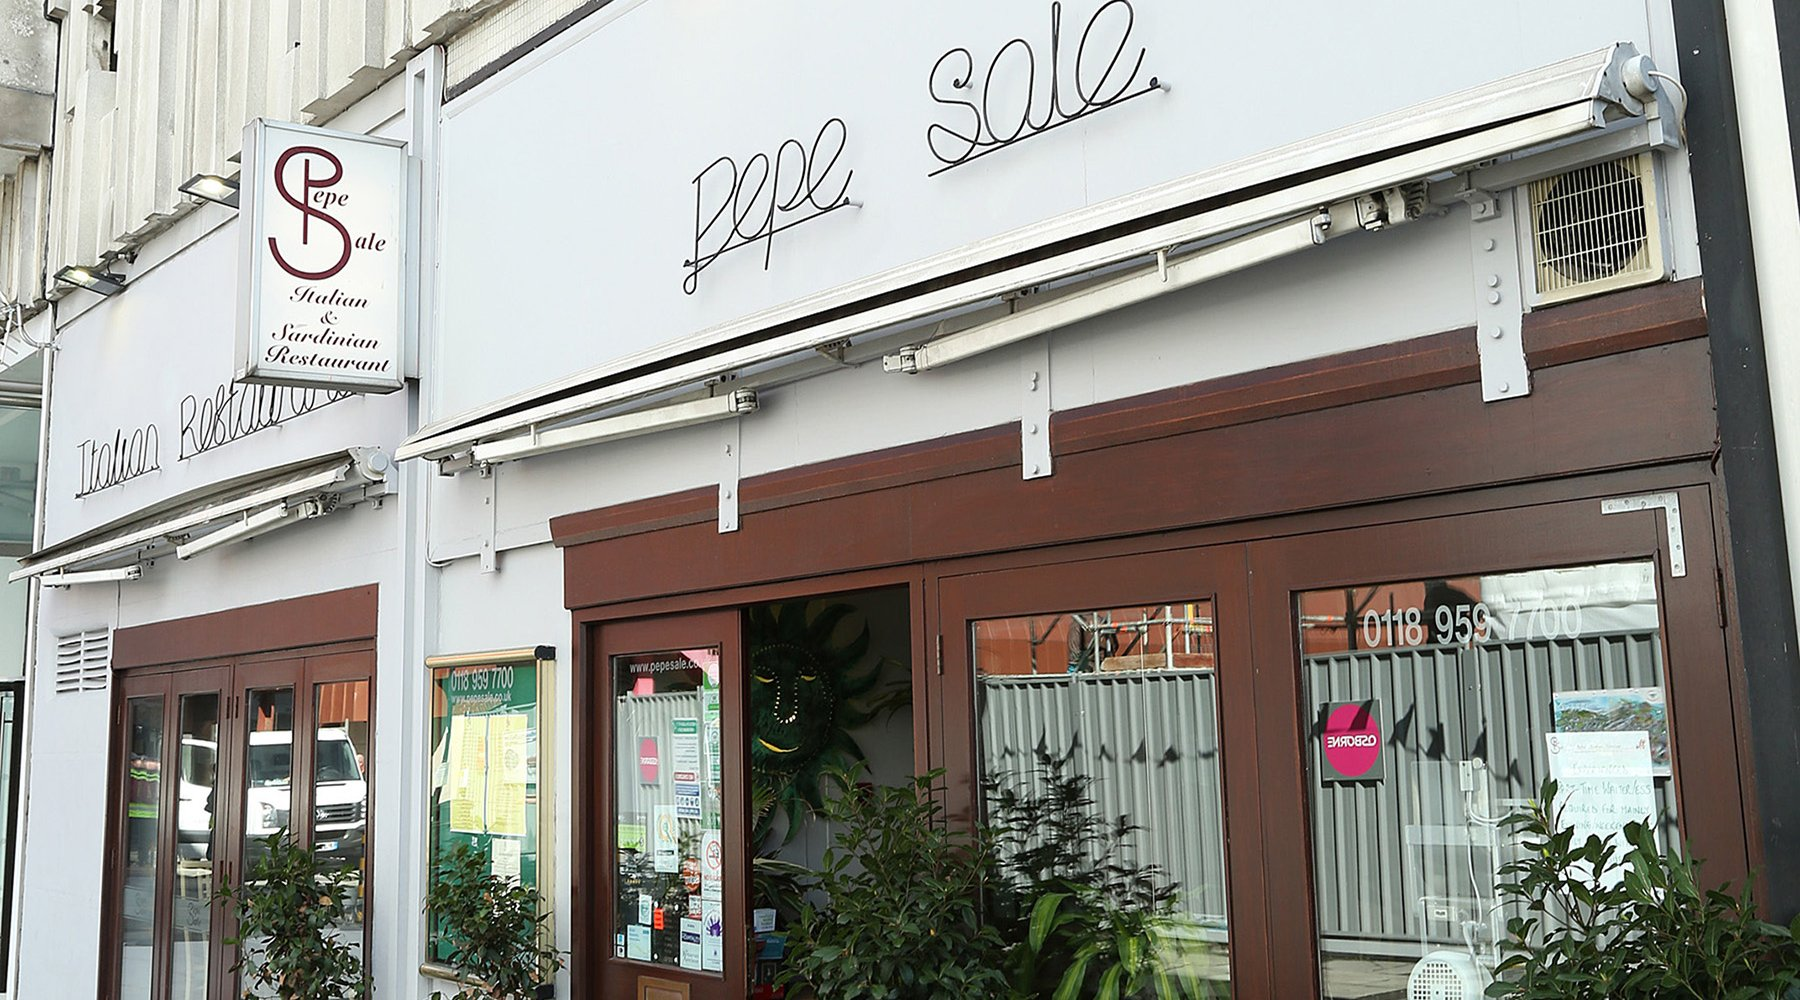 Pepe Sale